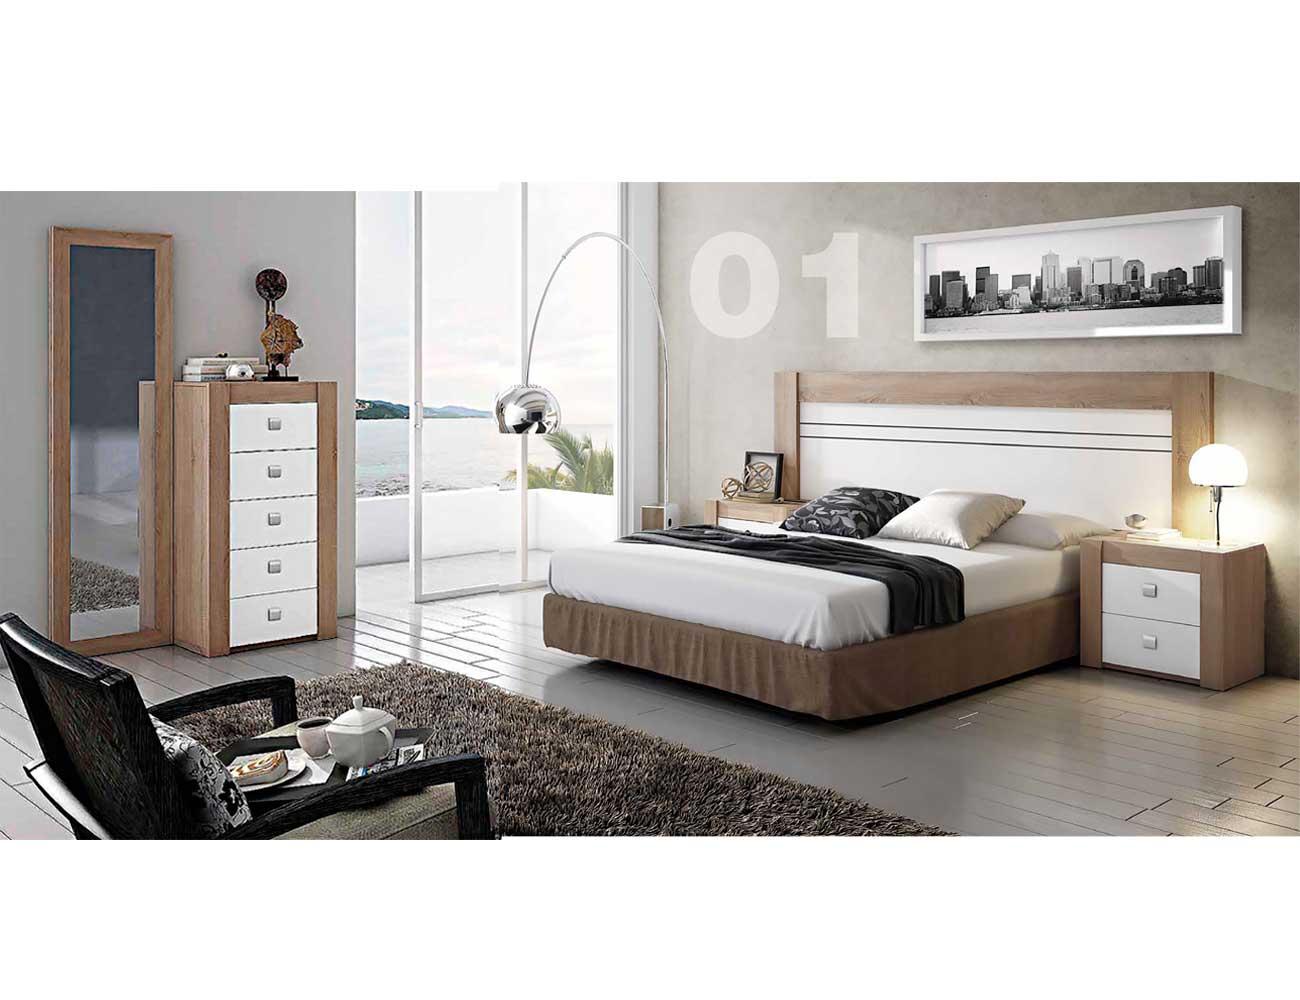 Dormitorio moderno cambrian blanco 02